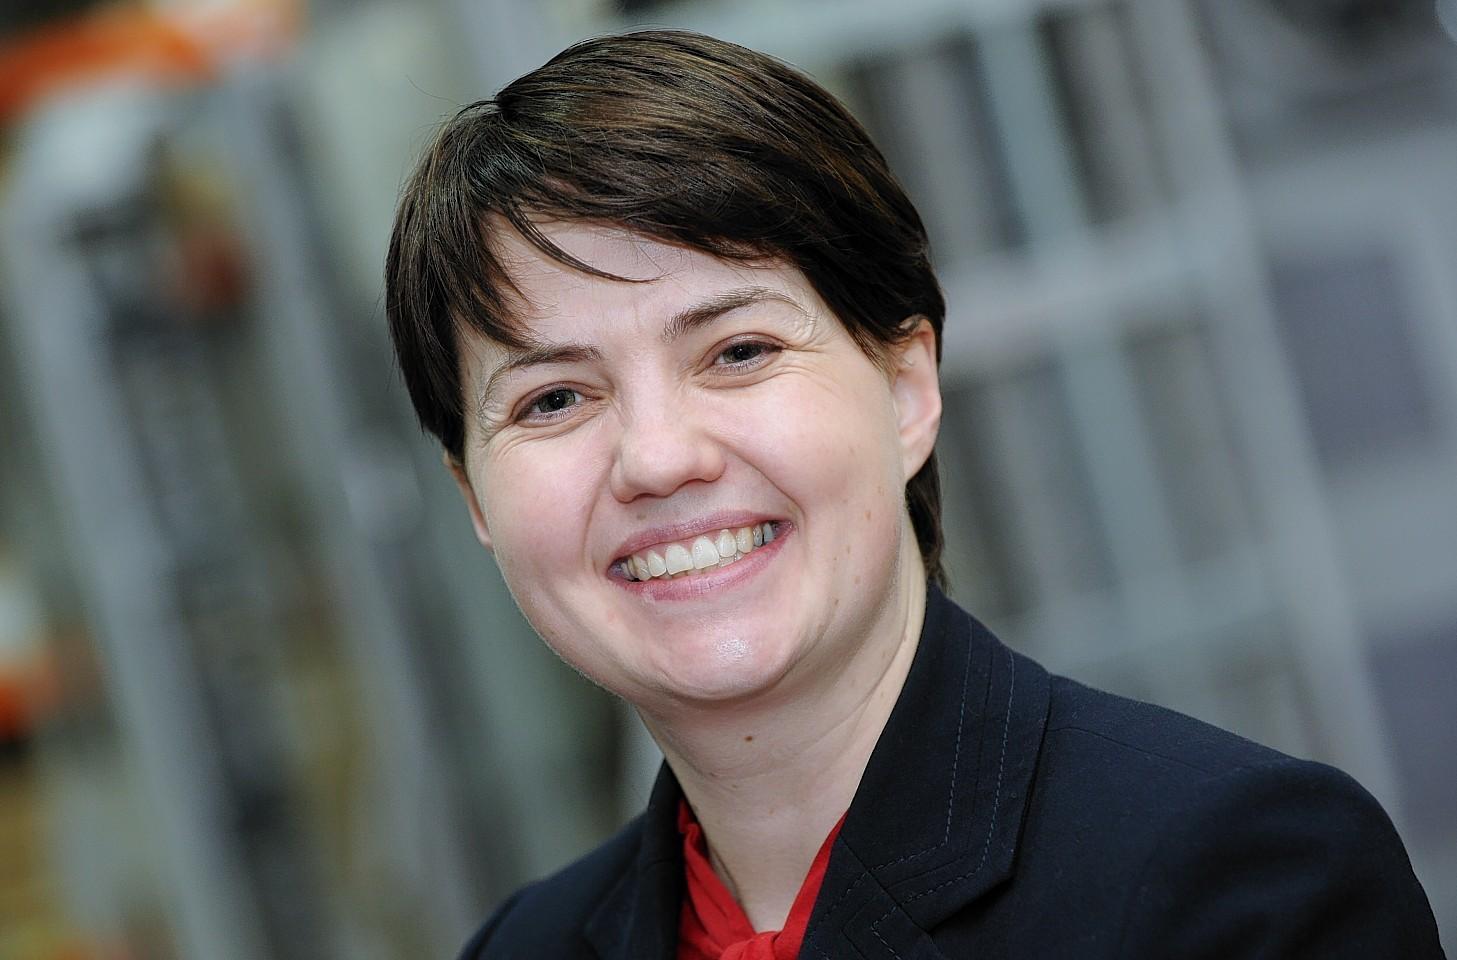 Scottish Conservatives leader Ruth Davidson